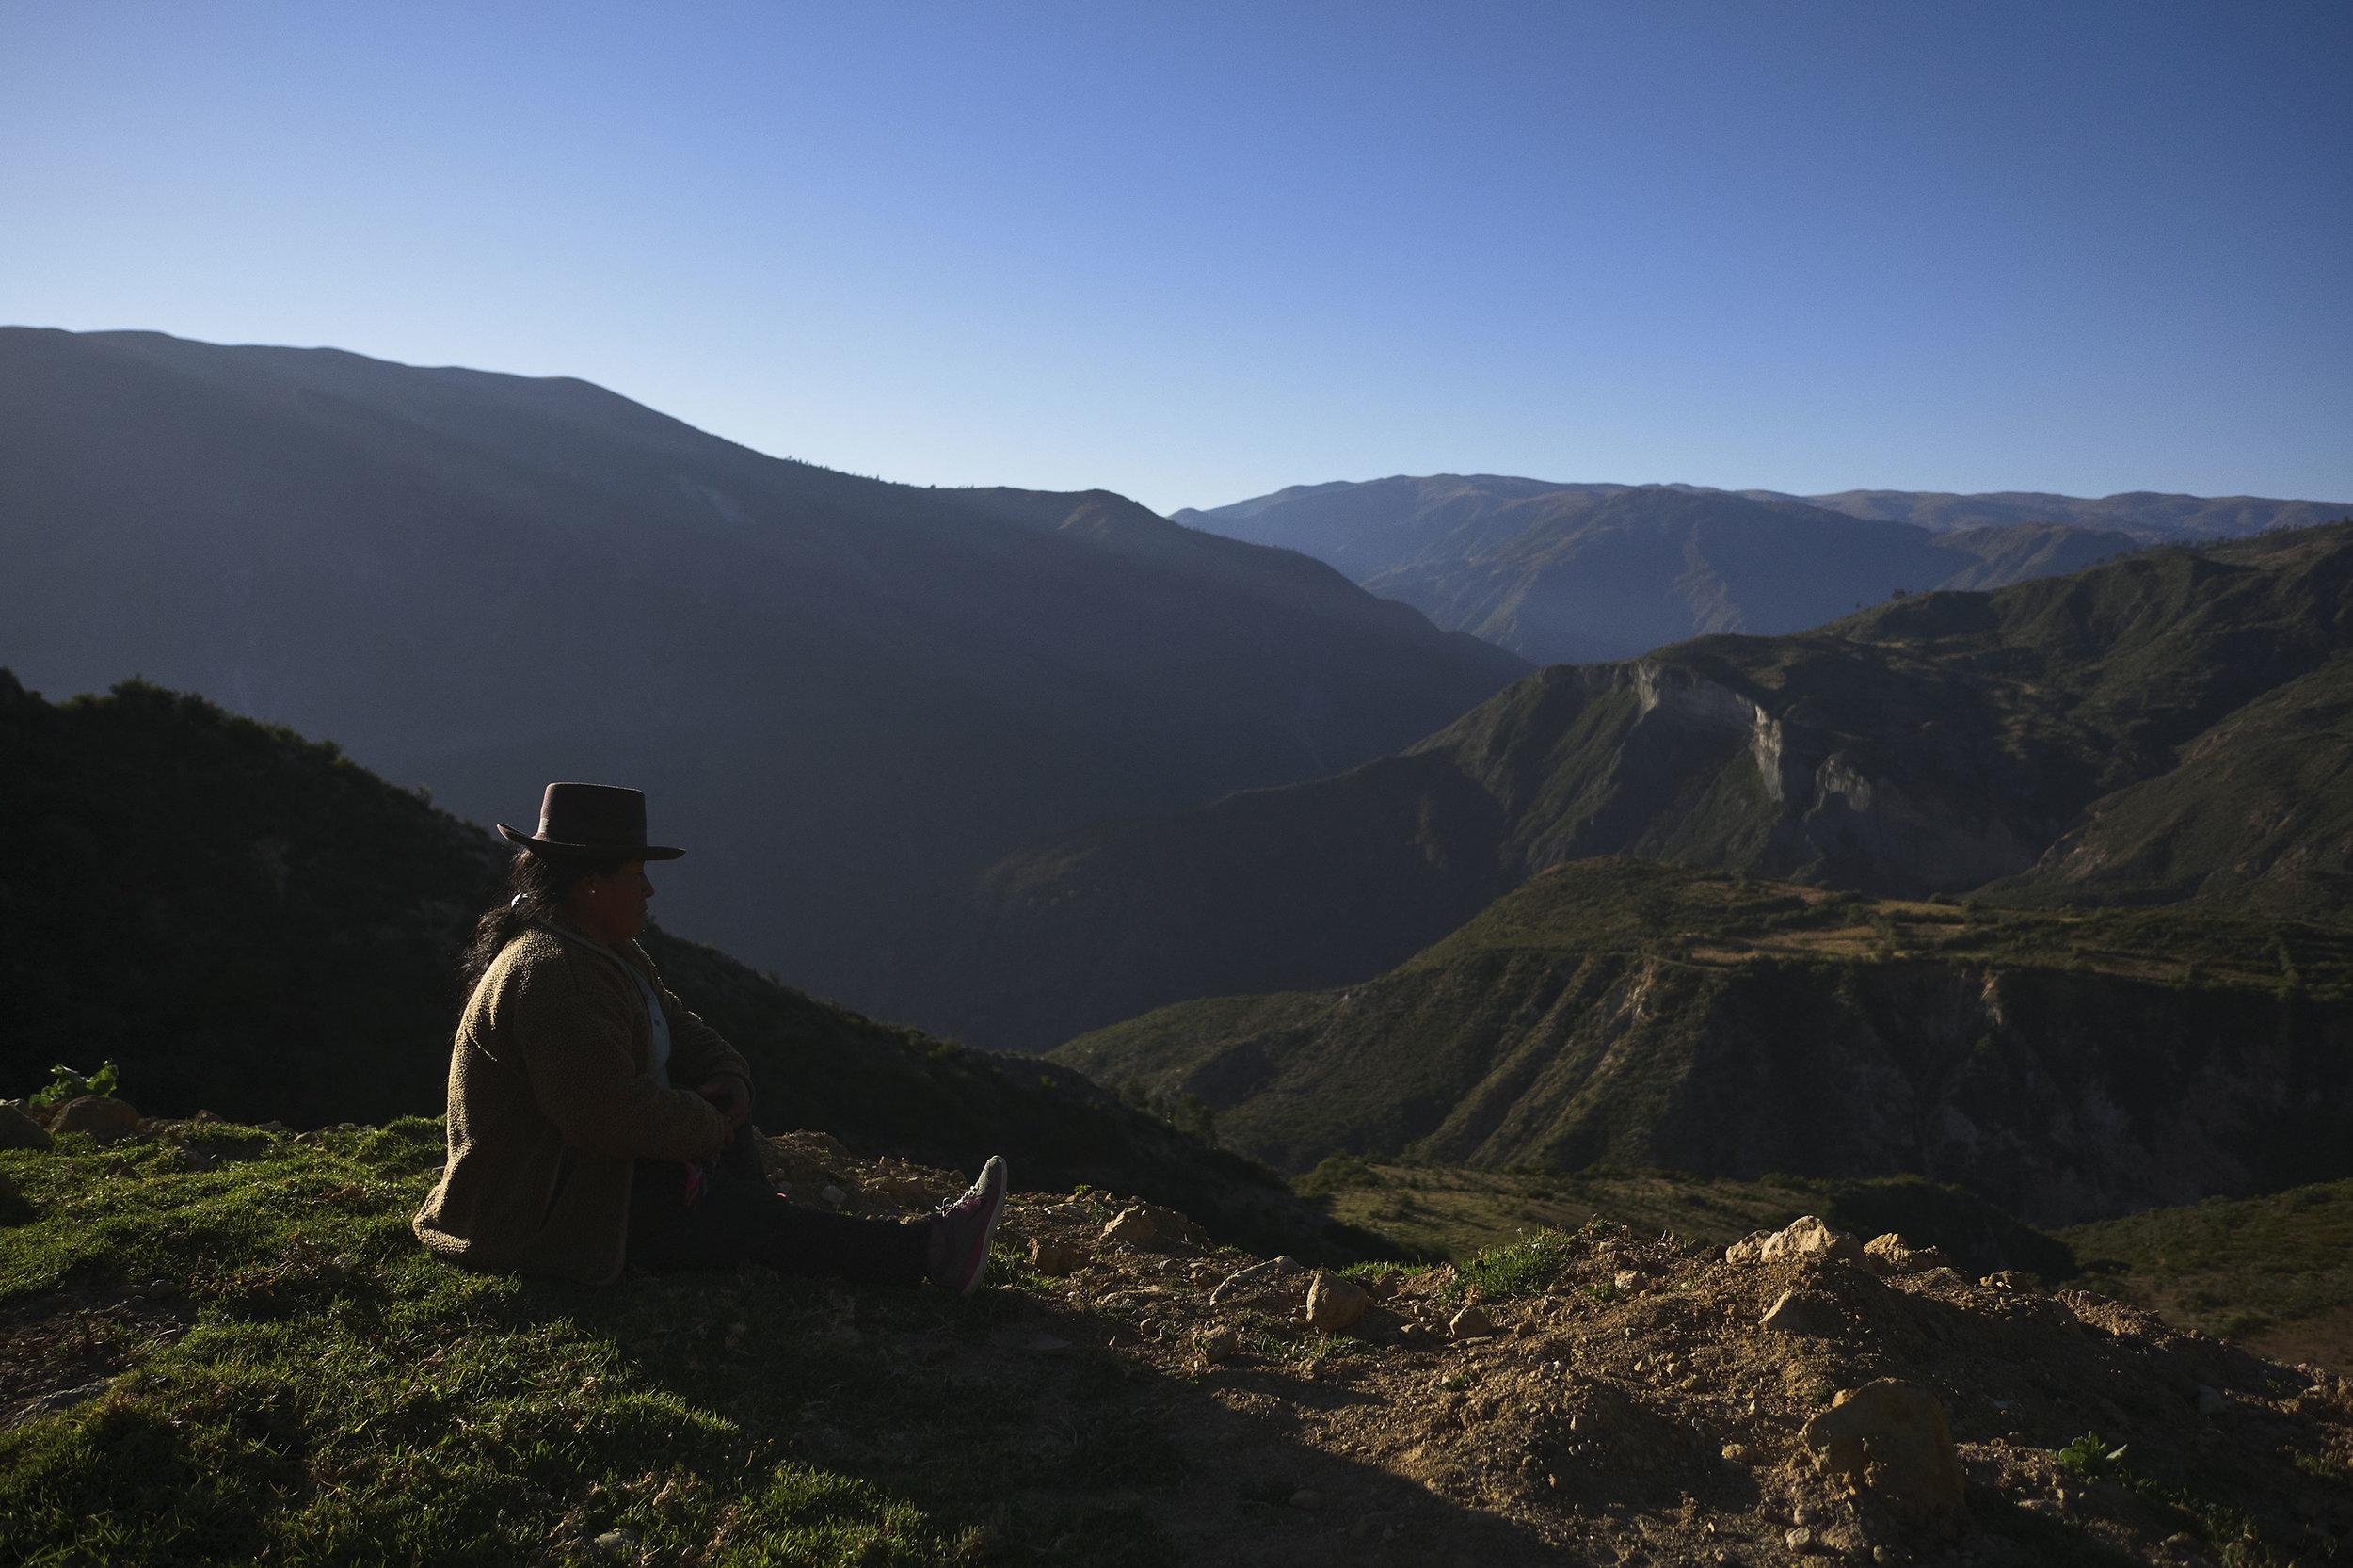 Rural woman with a mountain backdrop Ayacucho region, Peru